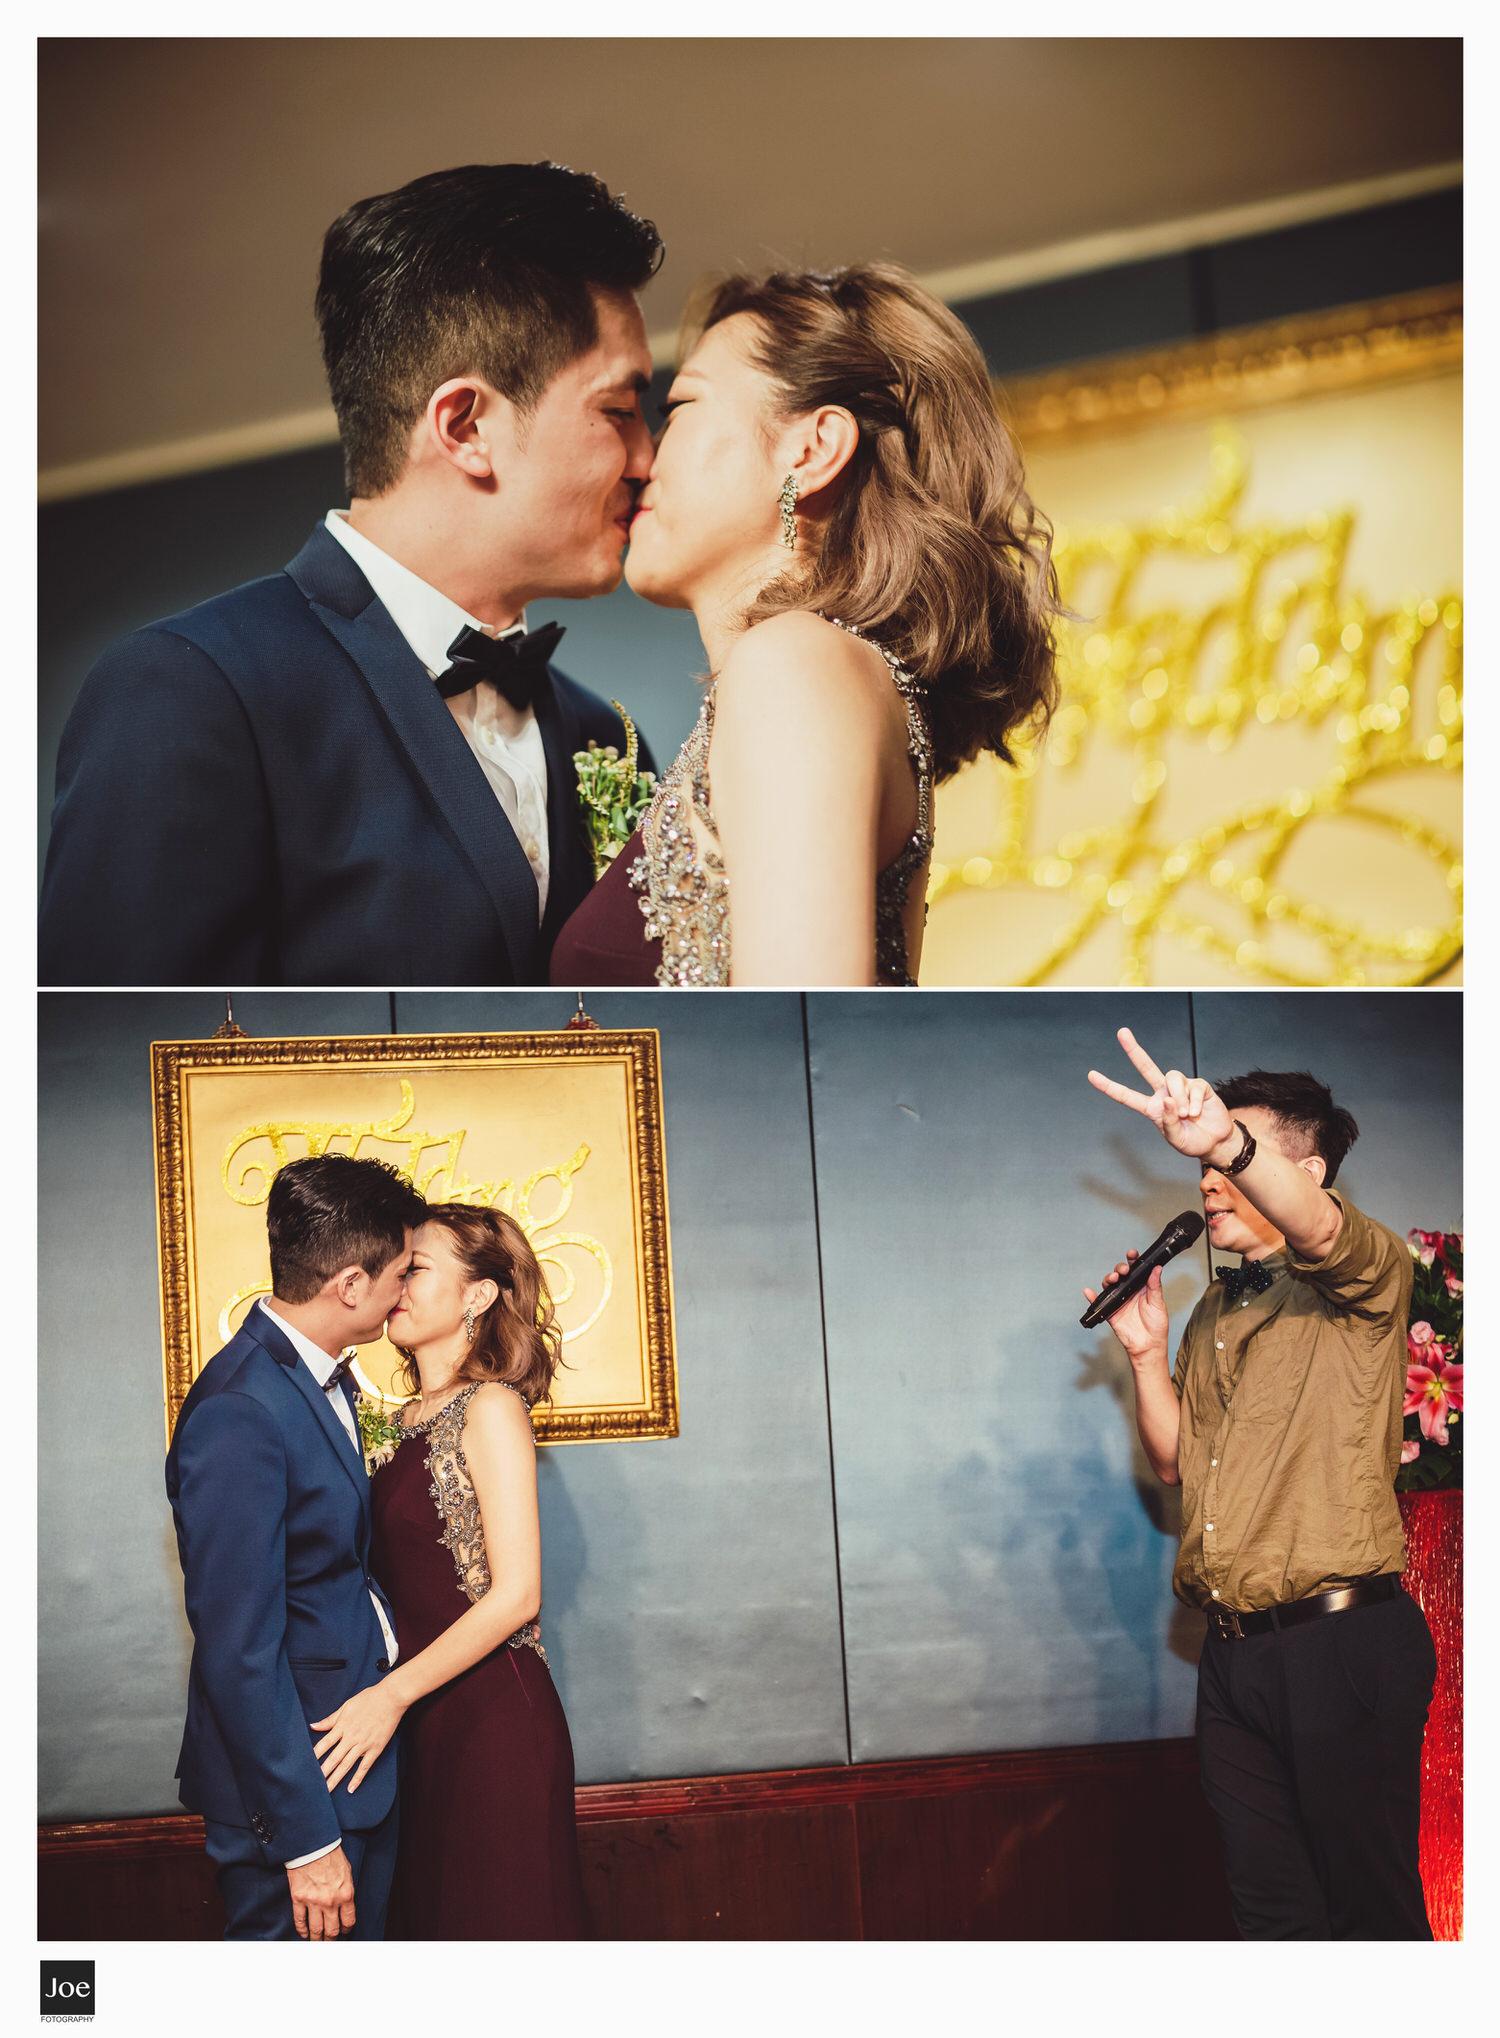 wedding-photography-shangri-la-far-eastern-plaza-hotel-ariel-sam-joe-fotography-168.jpg